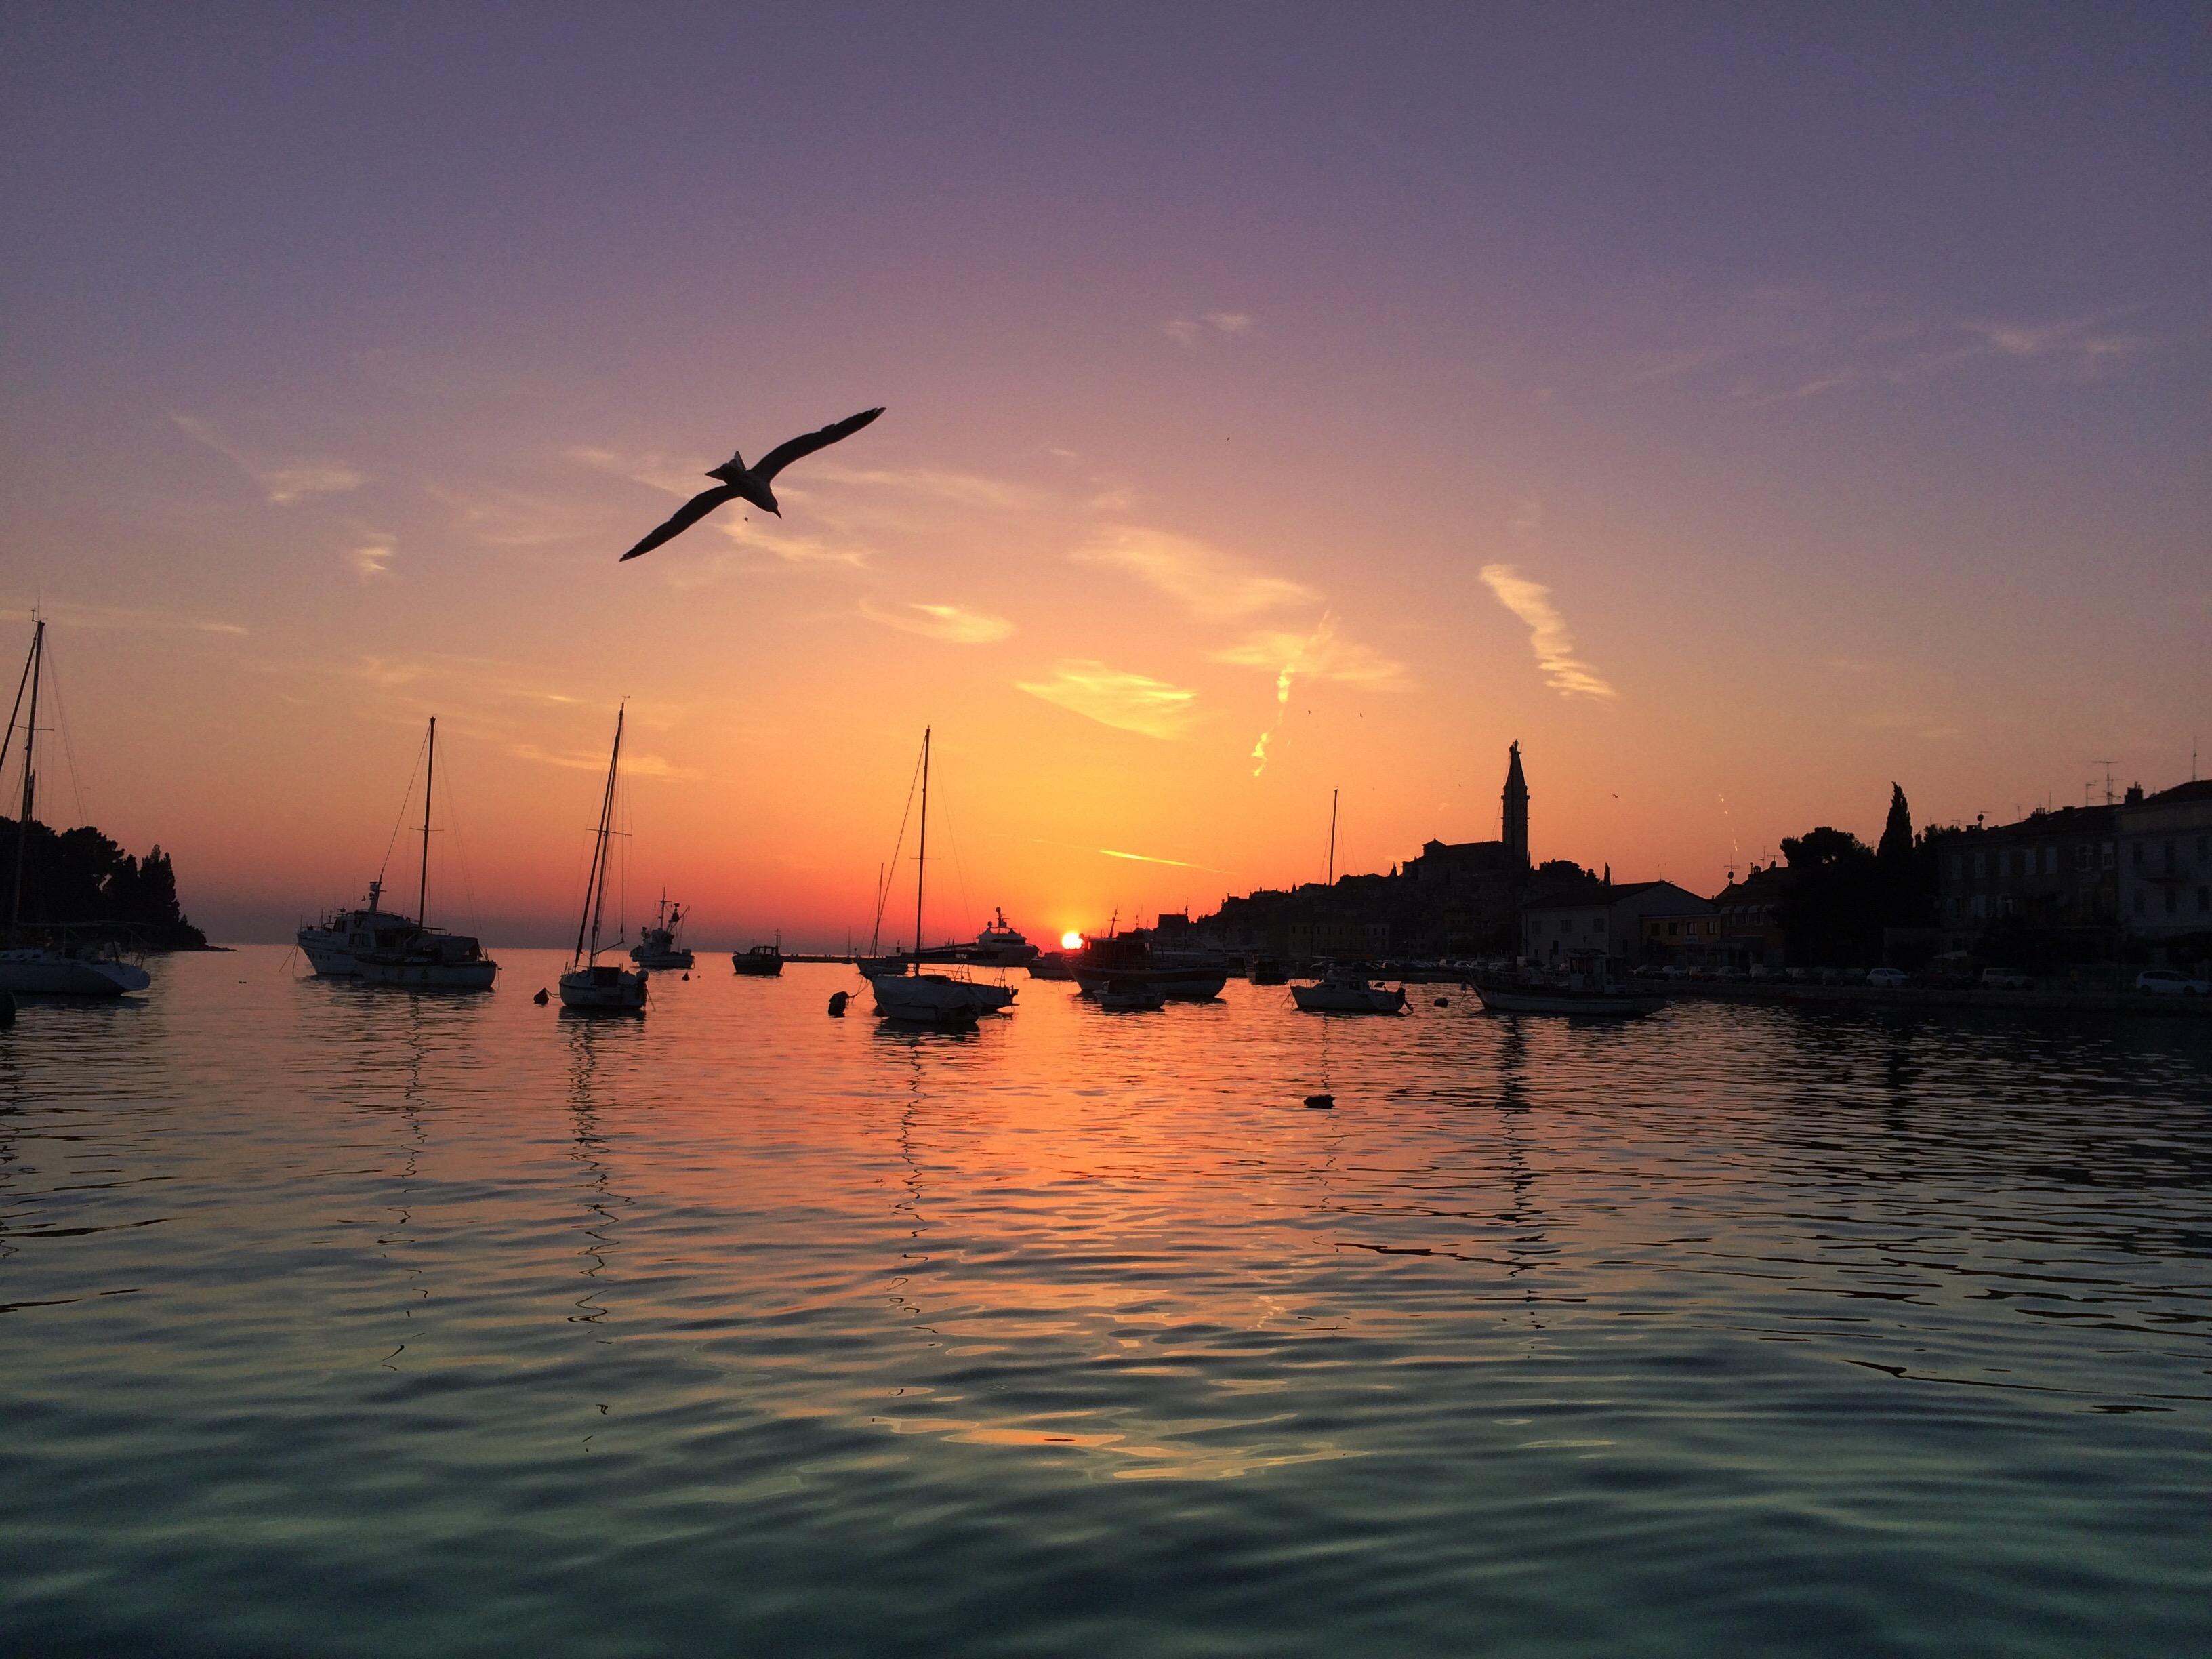 5-rovinj-croatia-sunset-silhouettes-birds-girltripping